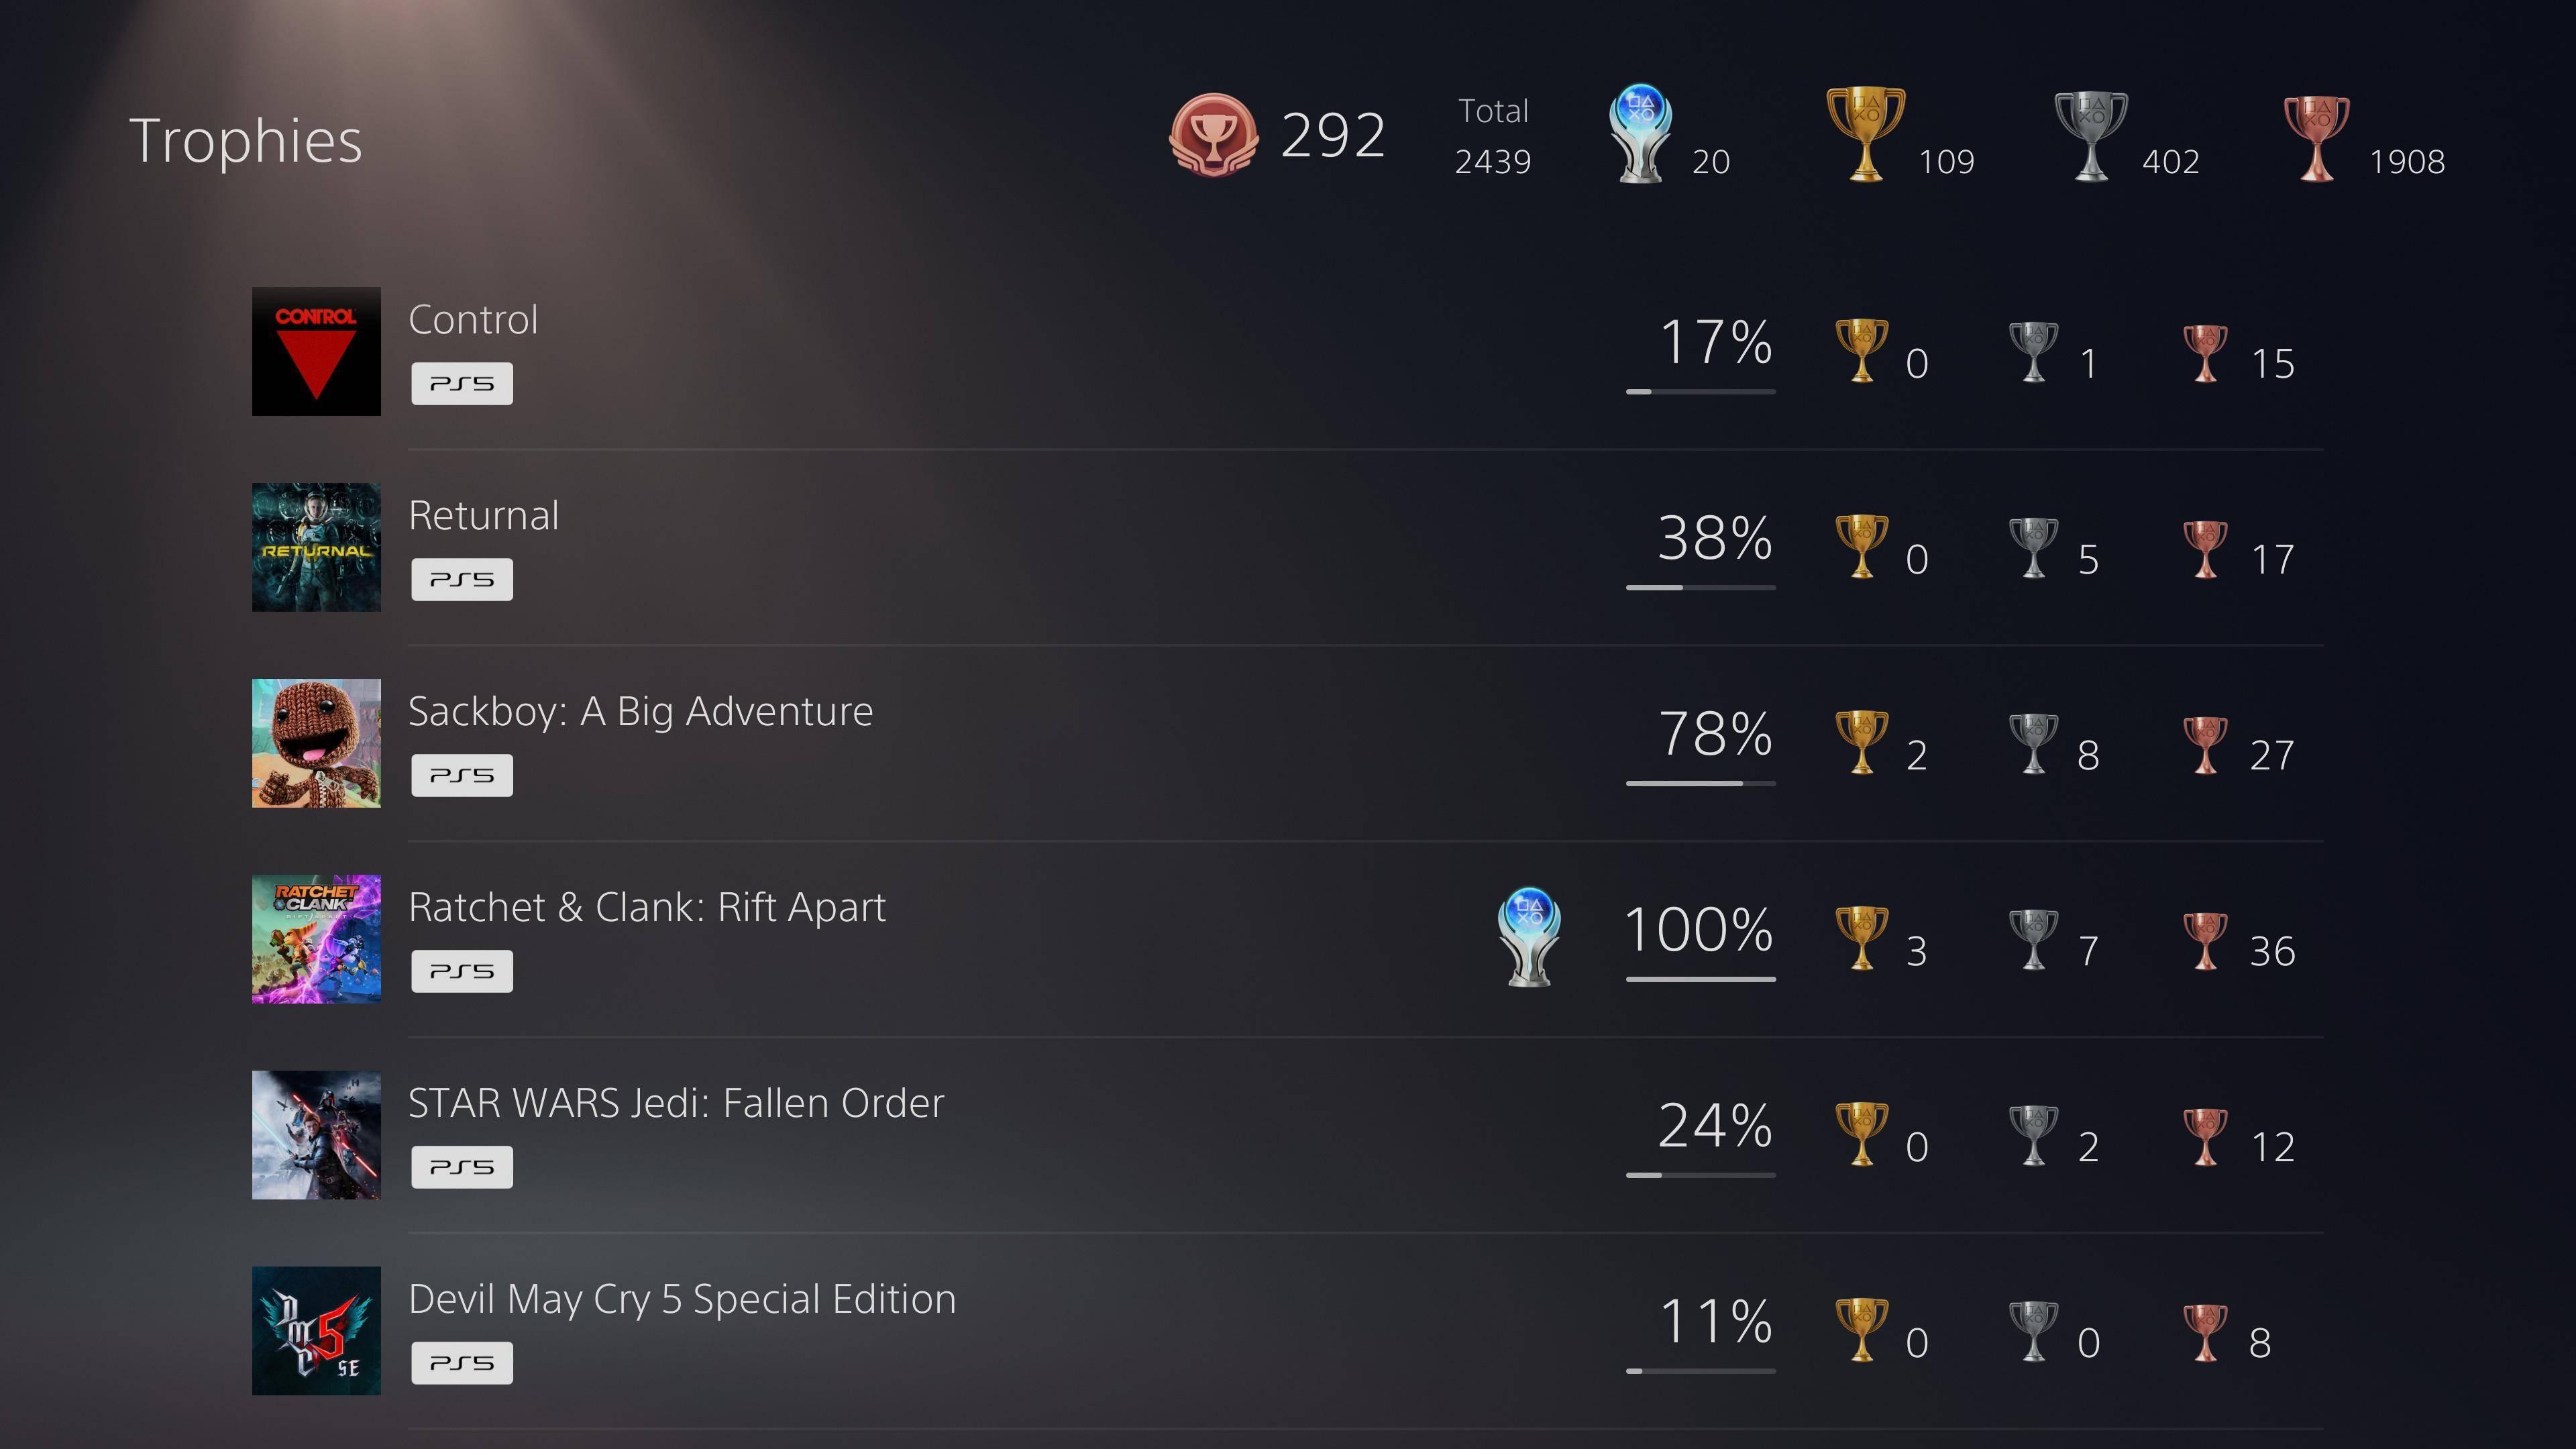 PS5 Trophies list showing multiple titles